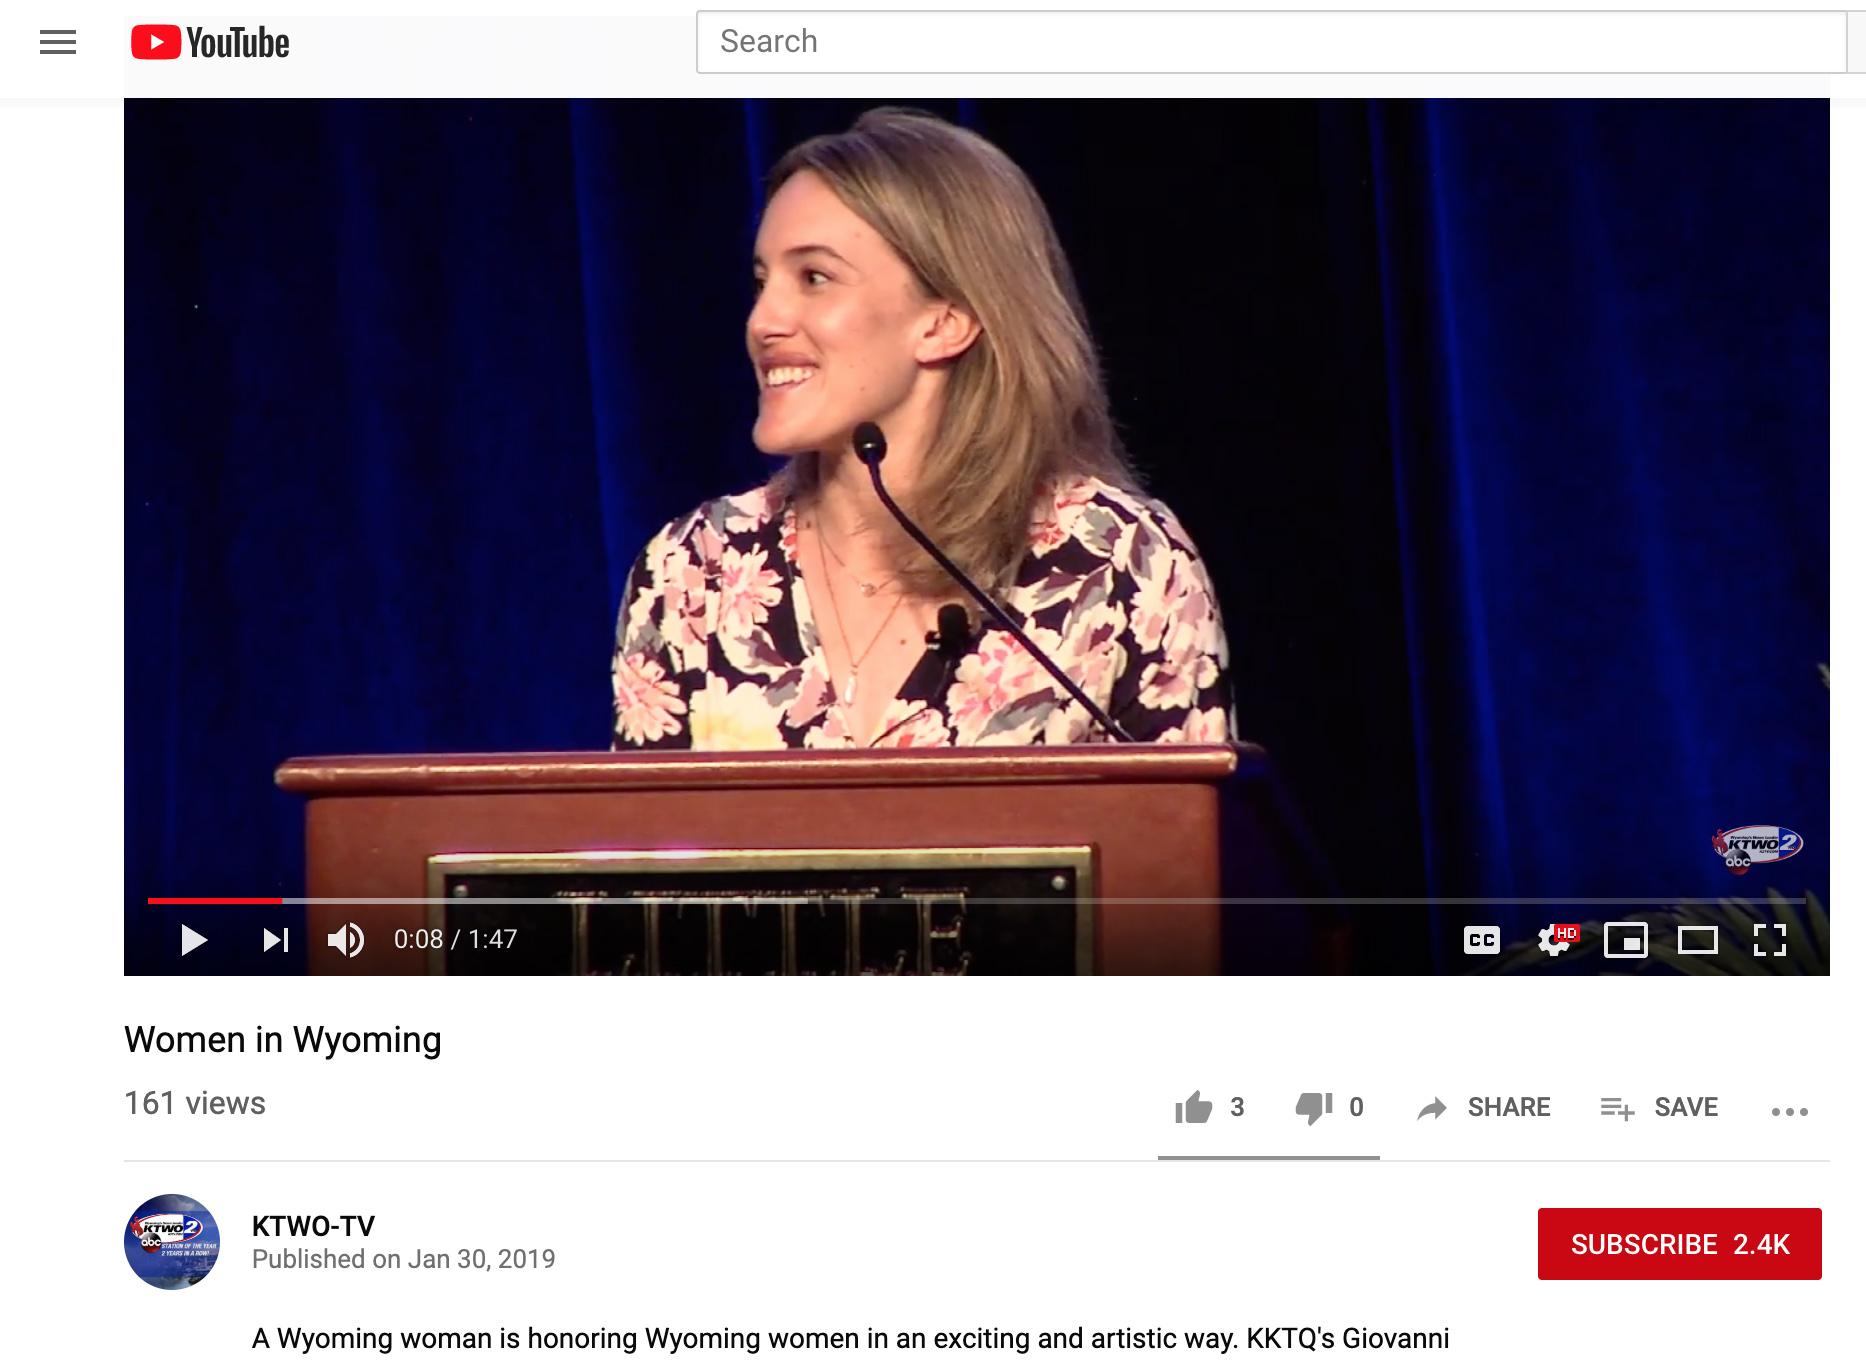 Women_in_Wyoming_Press_ktwotv.jpg